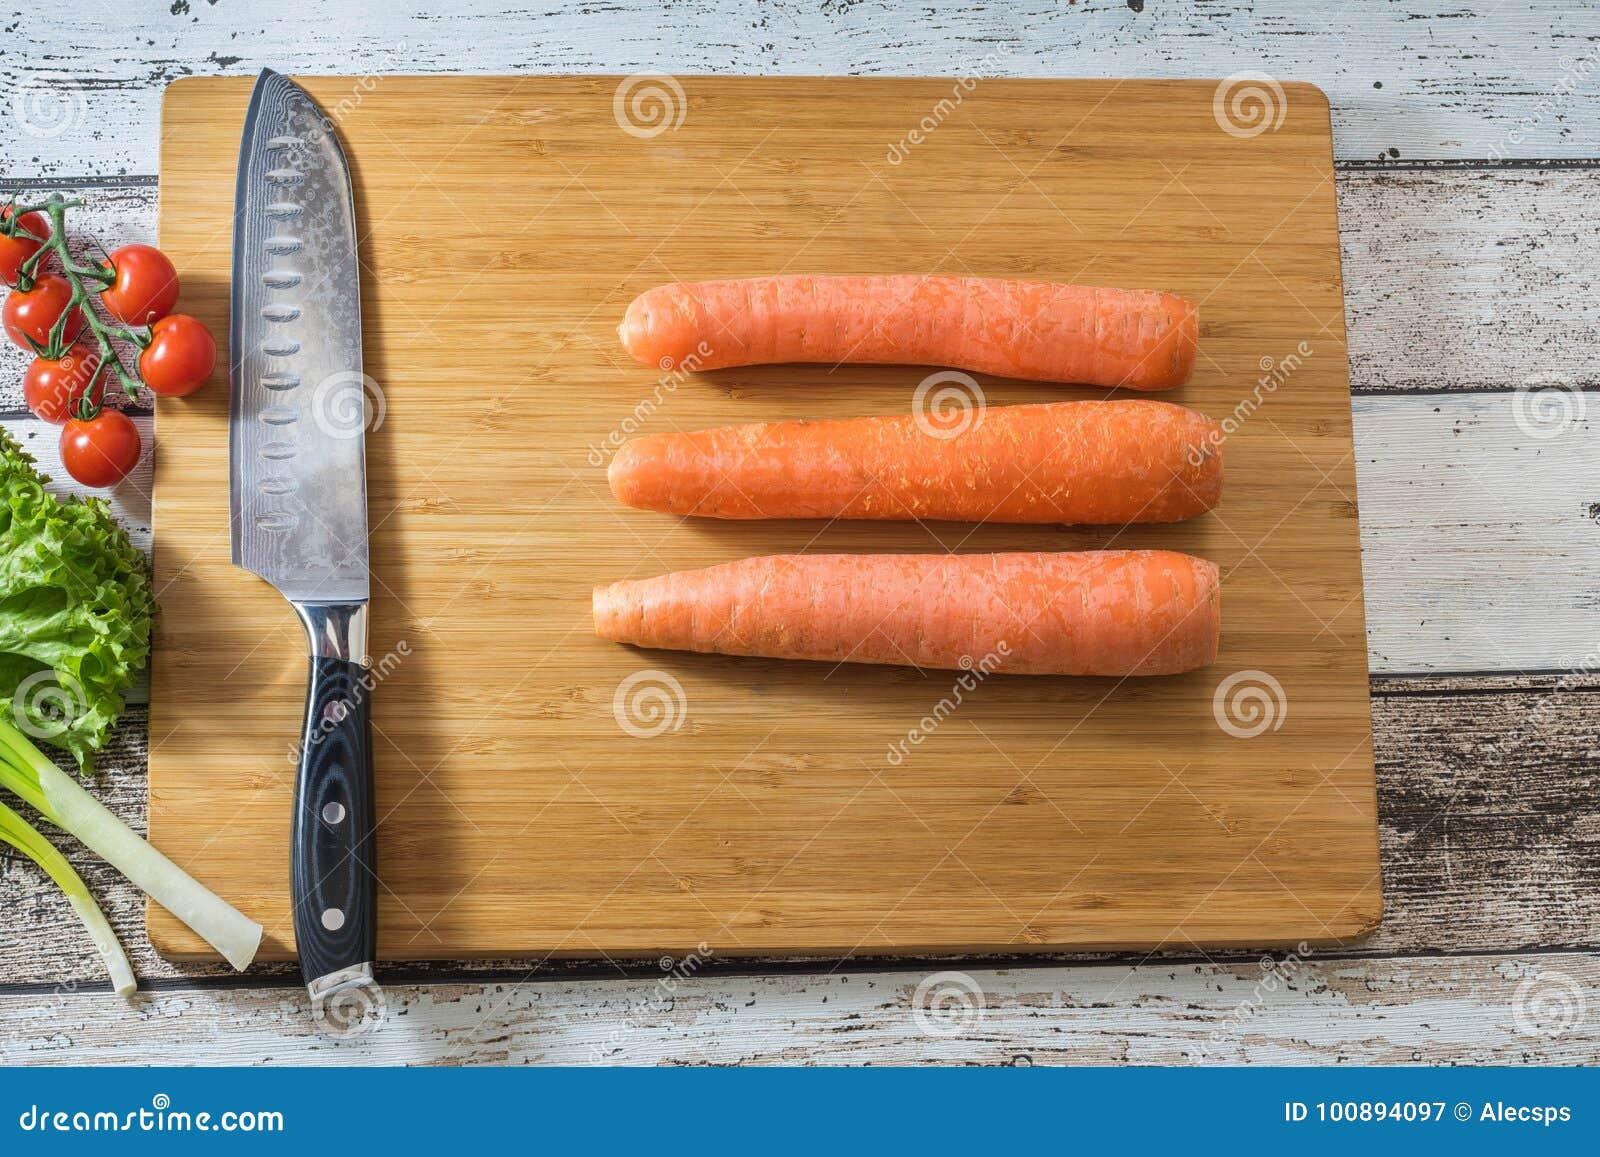 Лук морковь схема